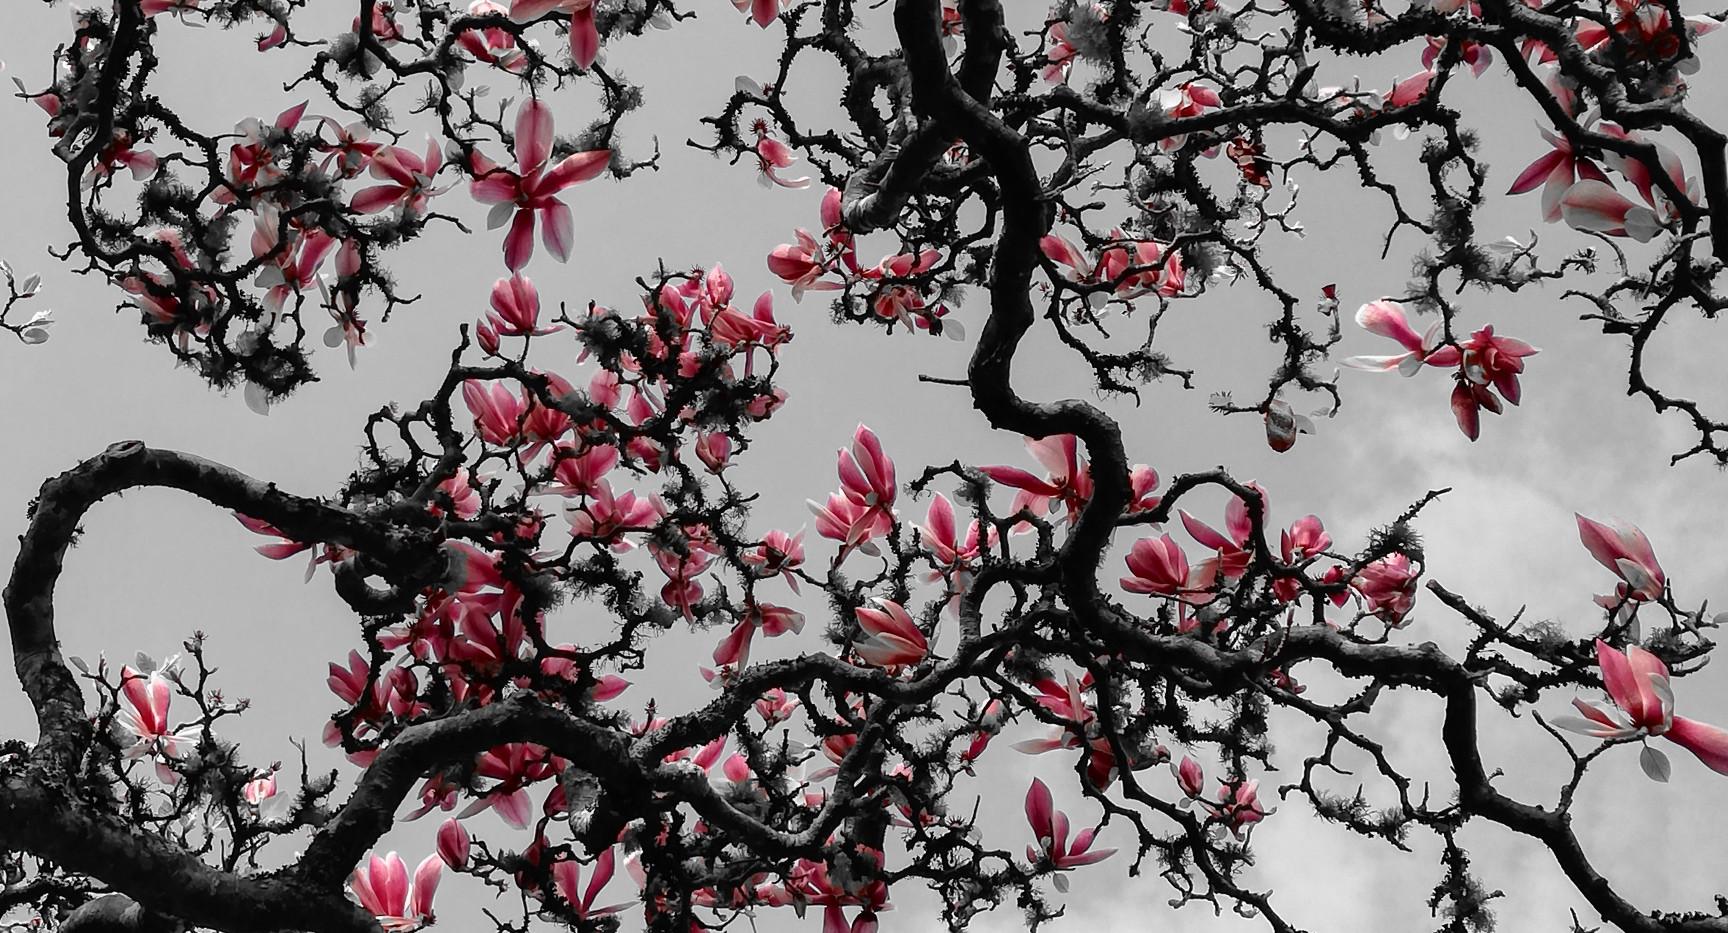 Magnolia by Ginny MccMcCa